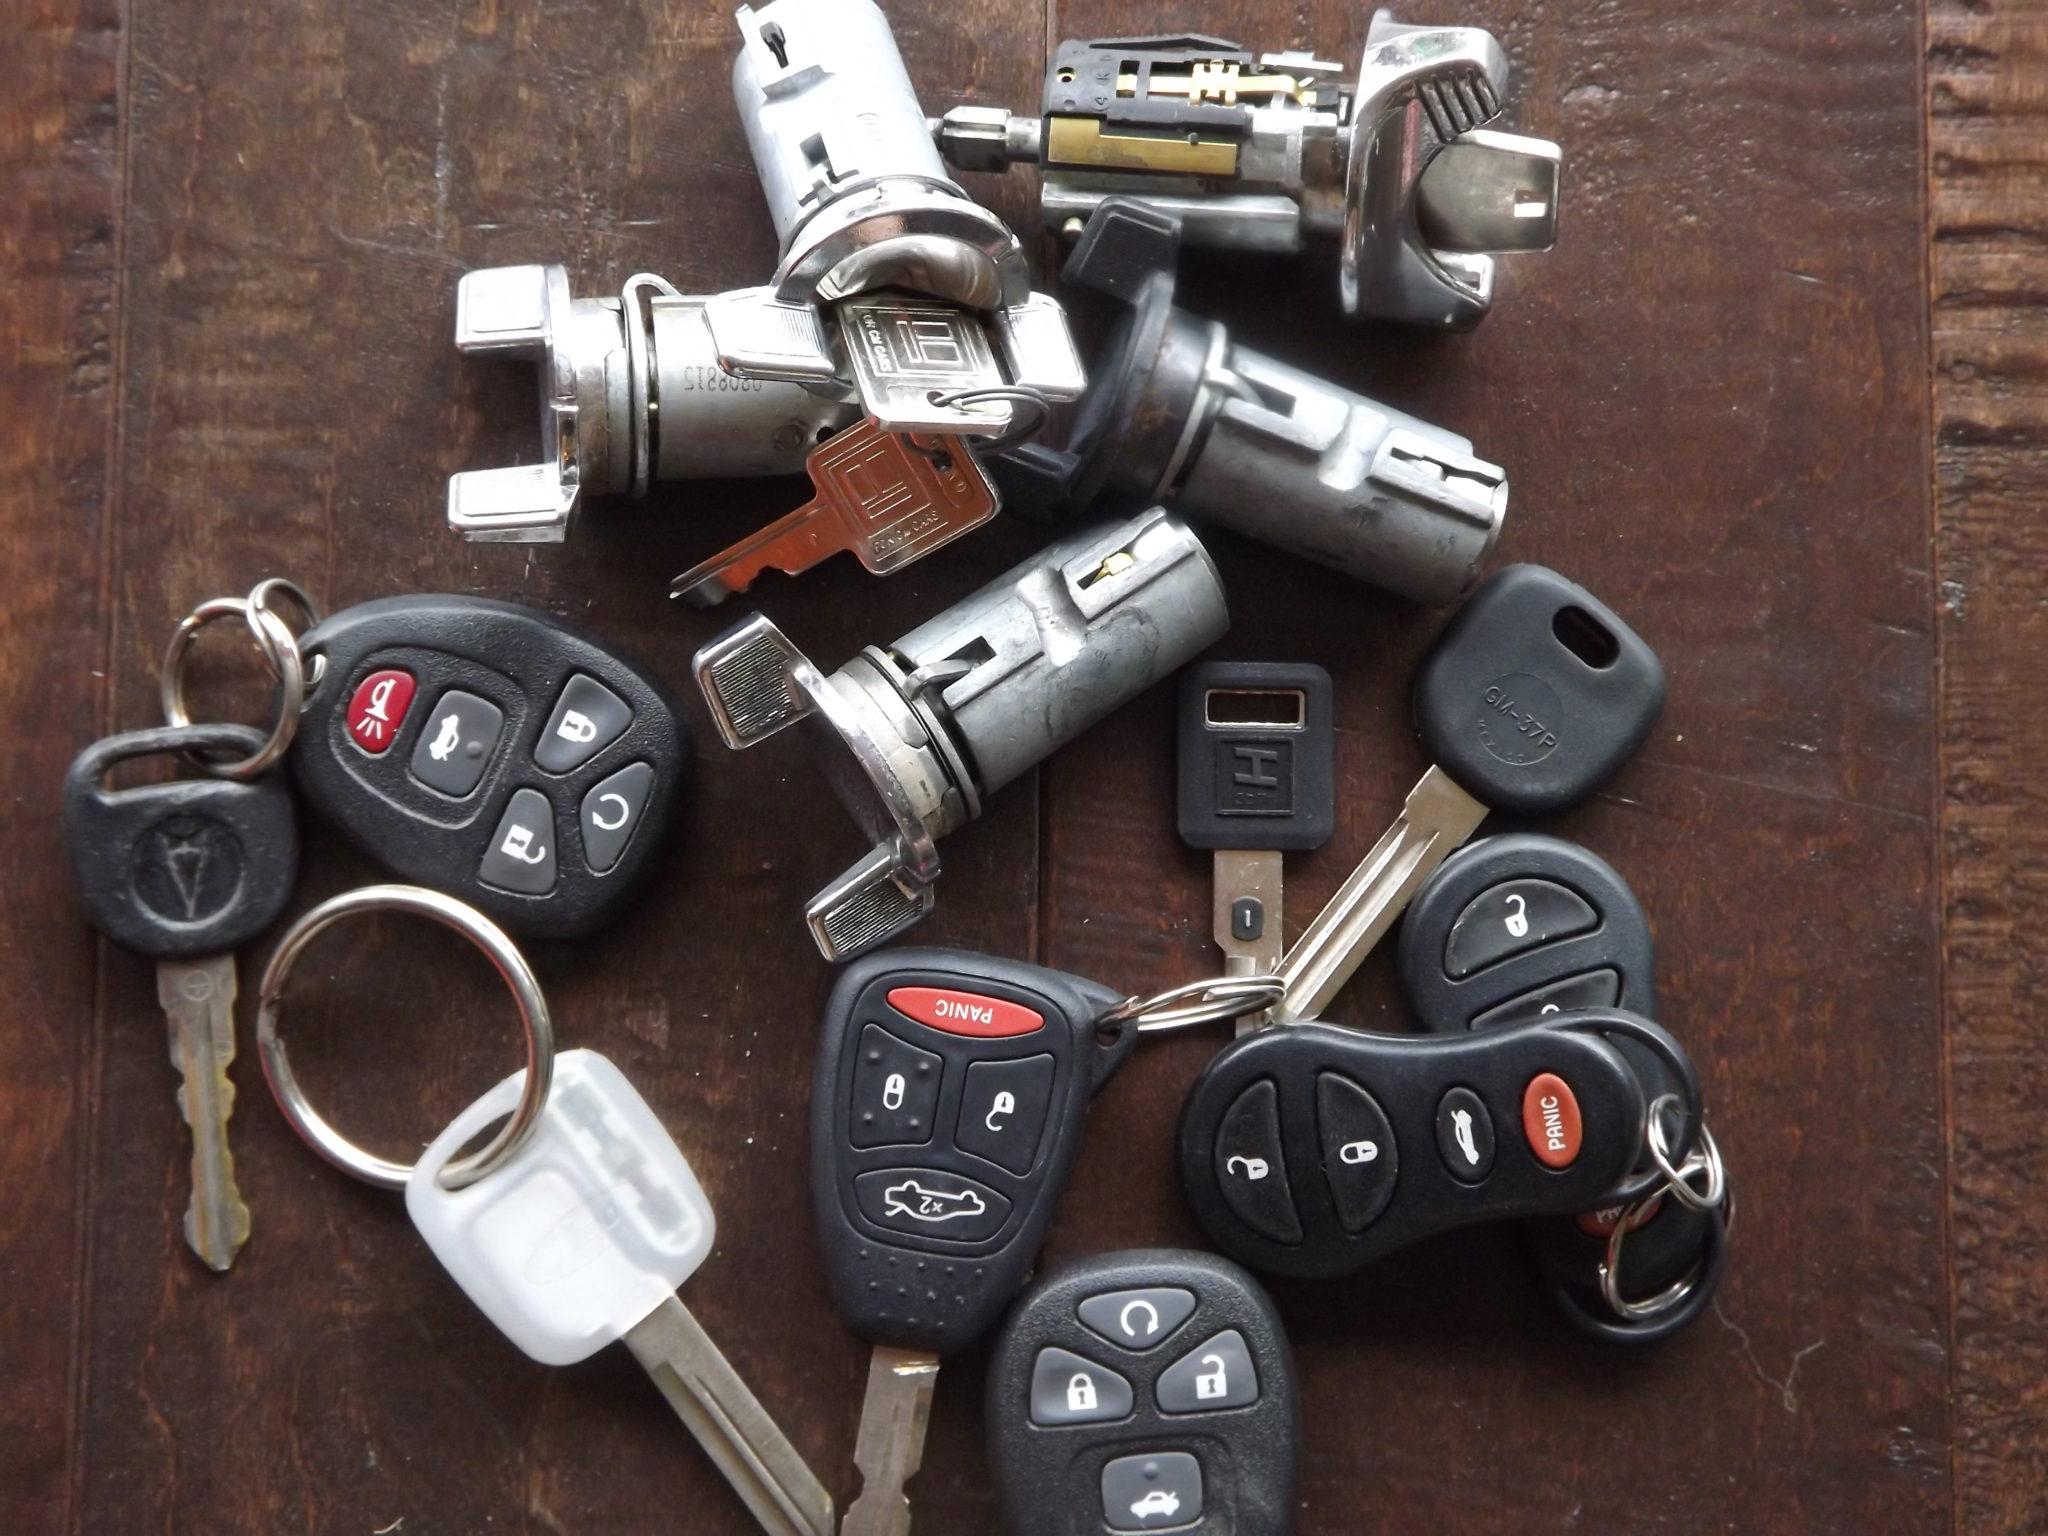 Keys locked in car automotive locksmith in phoenix arizona - Car Keys Chip Keys And Ignitions